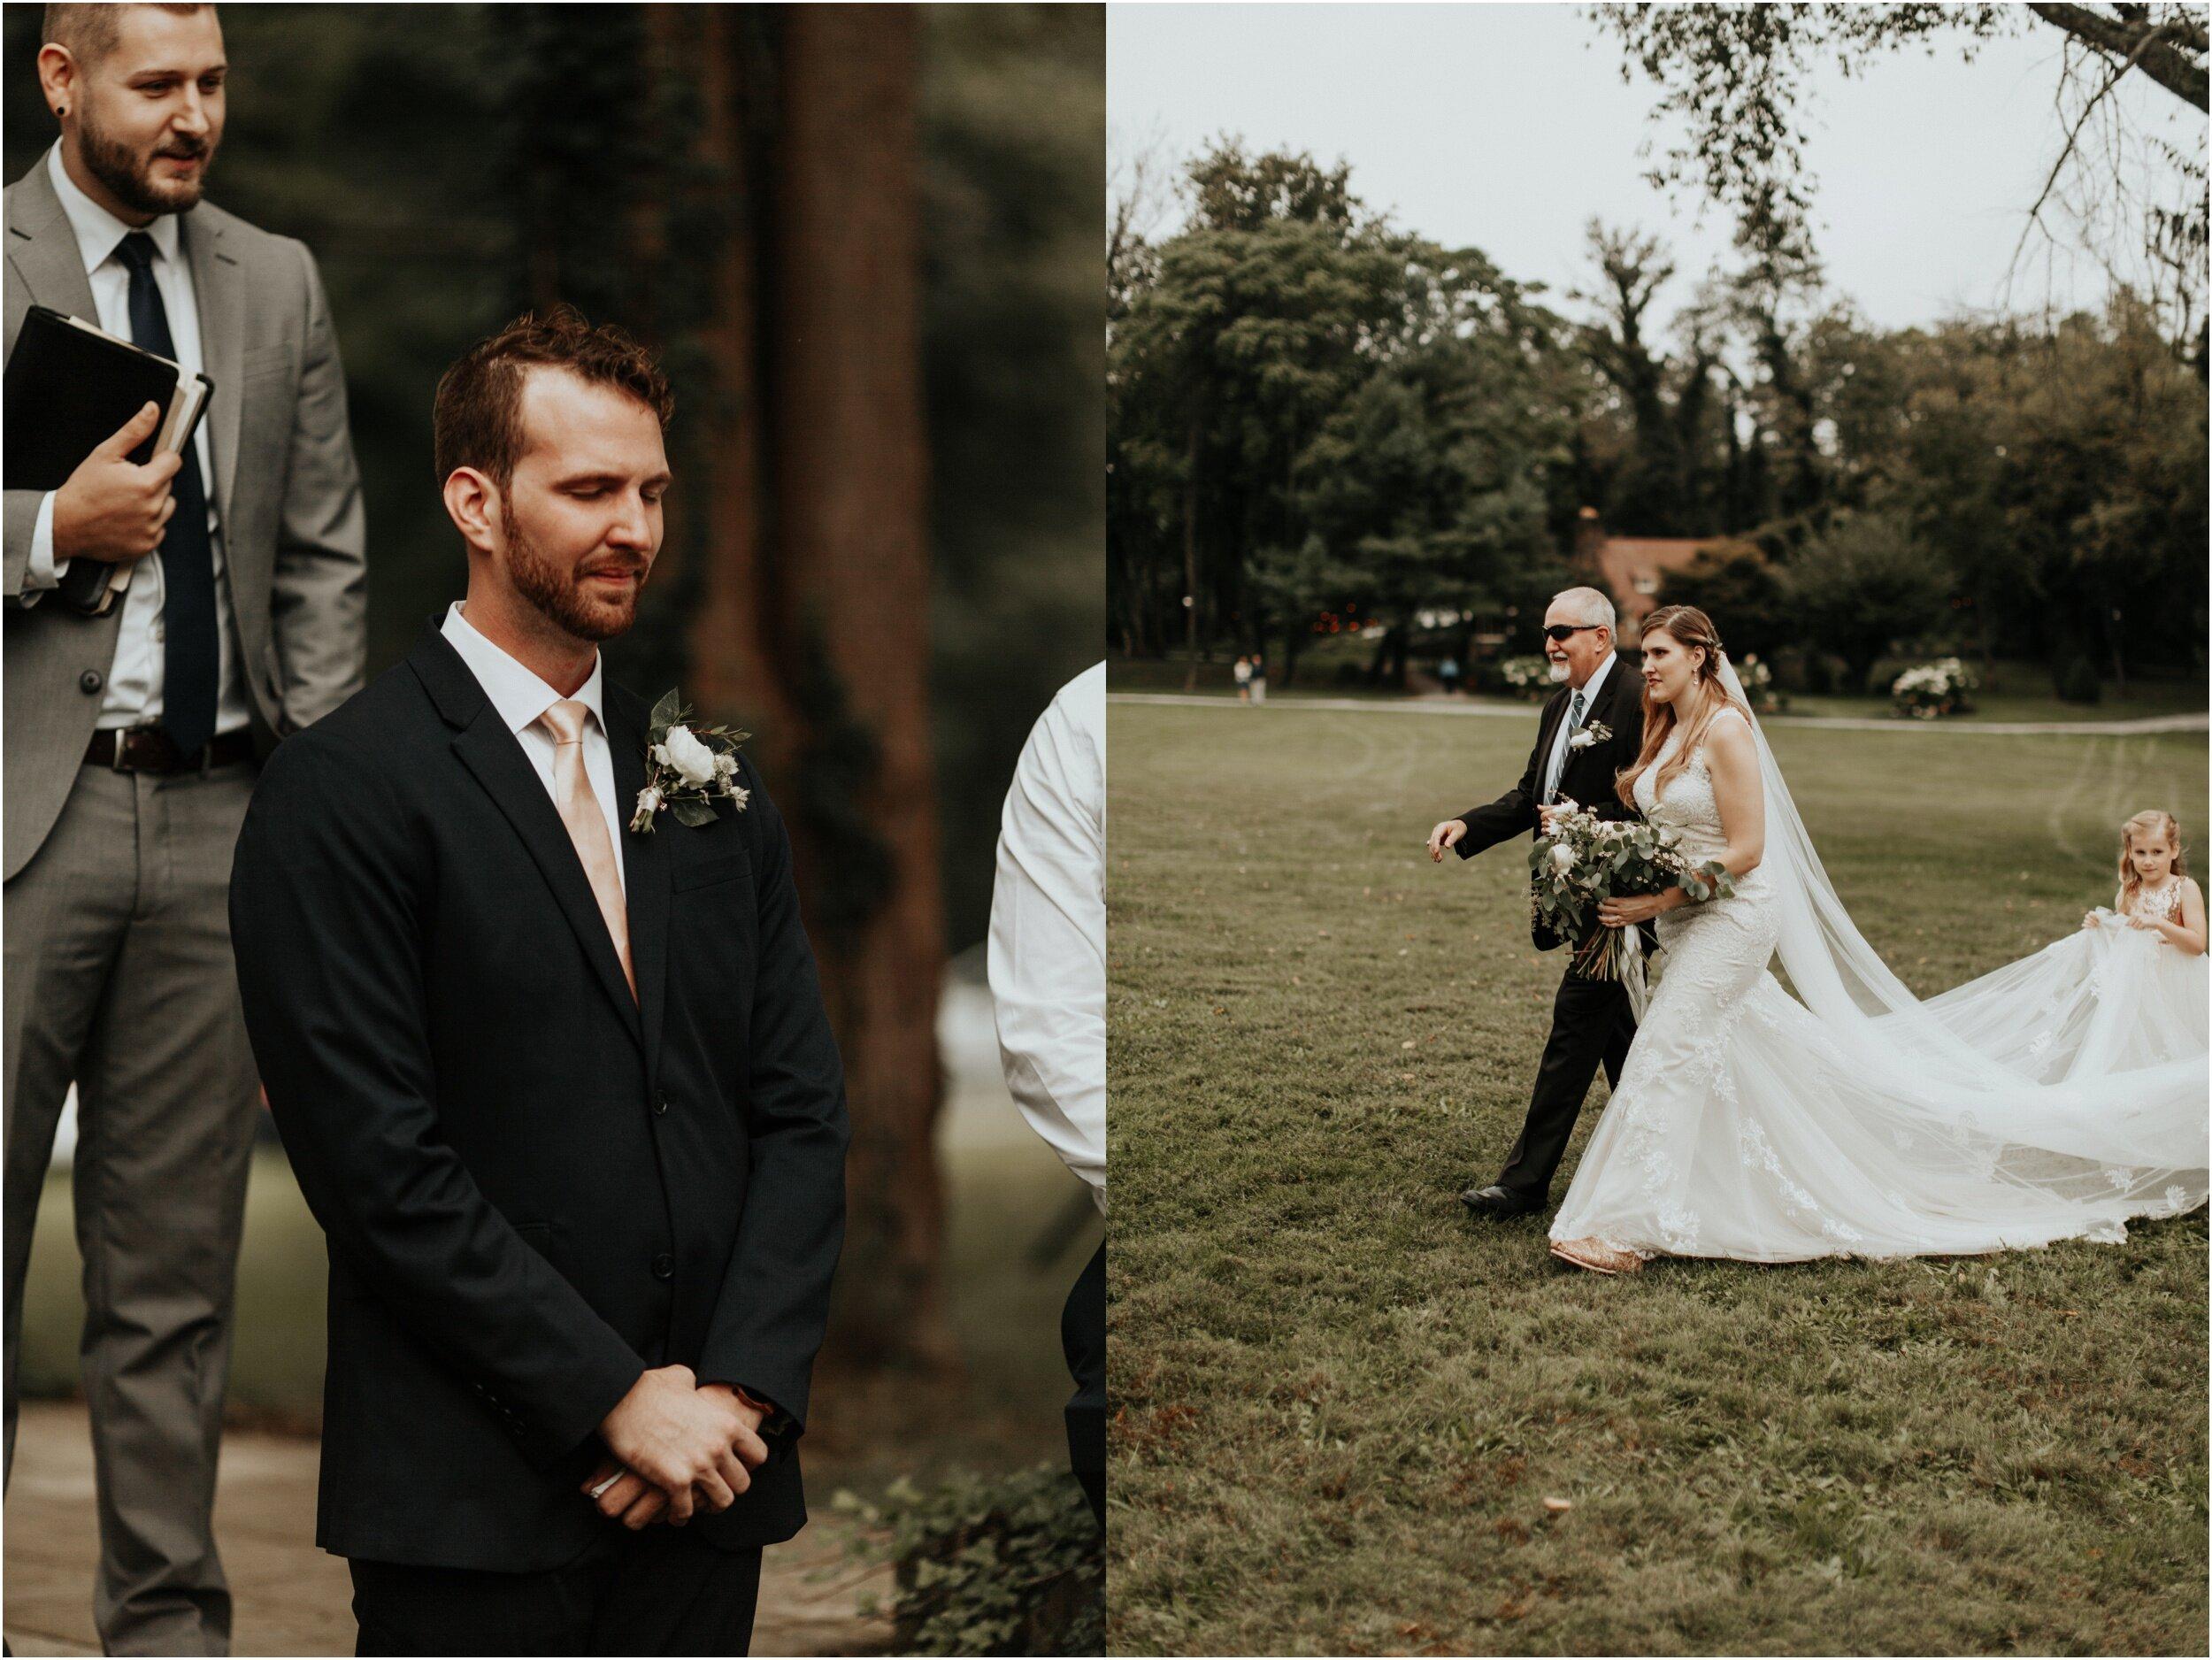 steph-and-jordan-cox-our-wedding-historic-shady-lane-compass-wedding-collective-hazel-lining-photography-destination-elopement-wedding-engagement-photography_0056.jpg